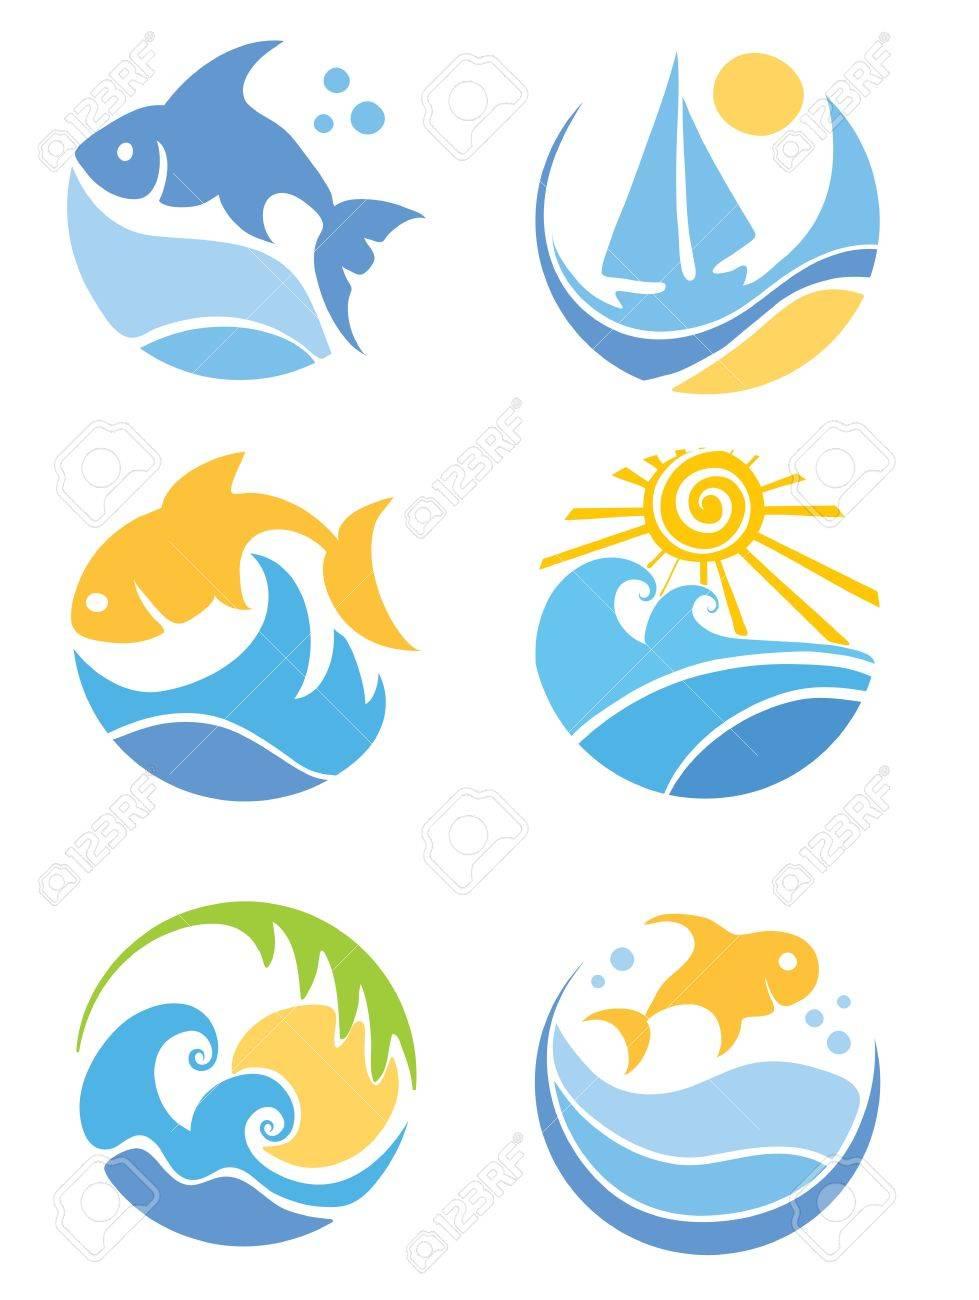 a set of icons of fish and sea royalty free cliparts vectors